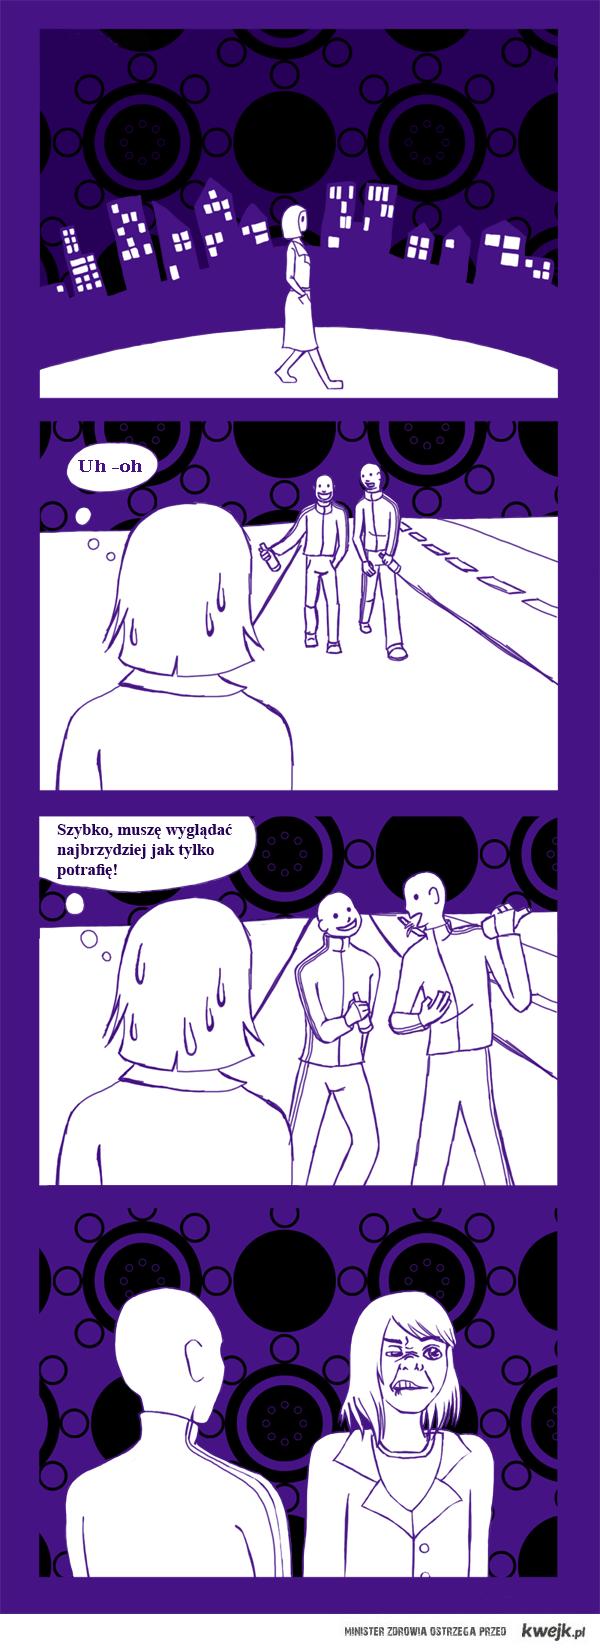 samoobrona